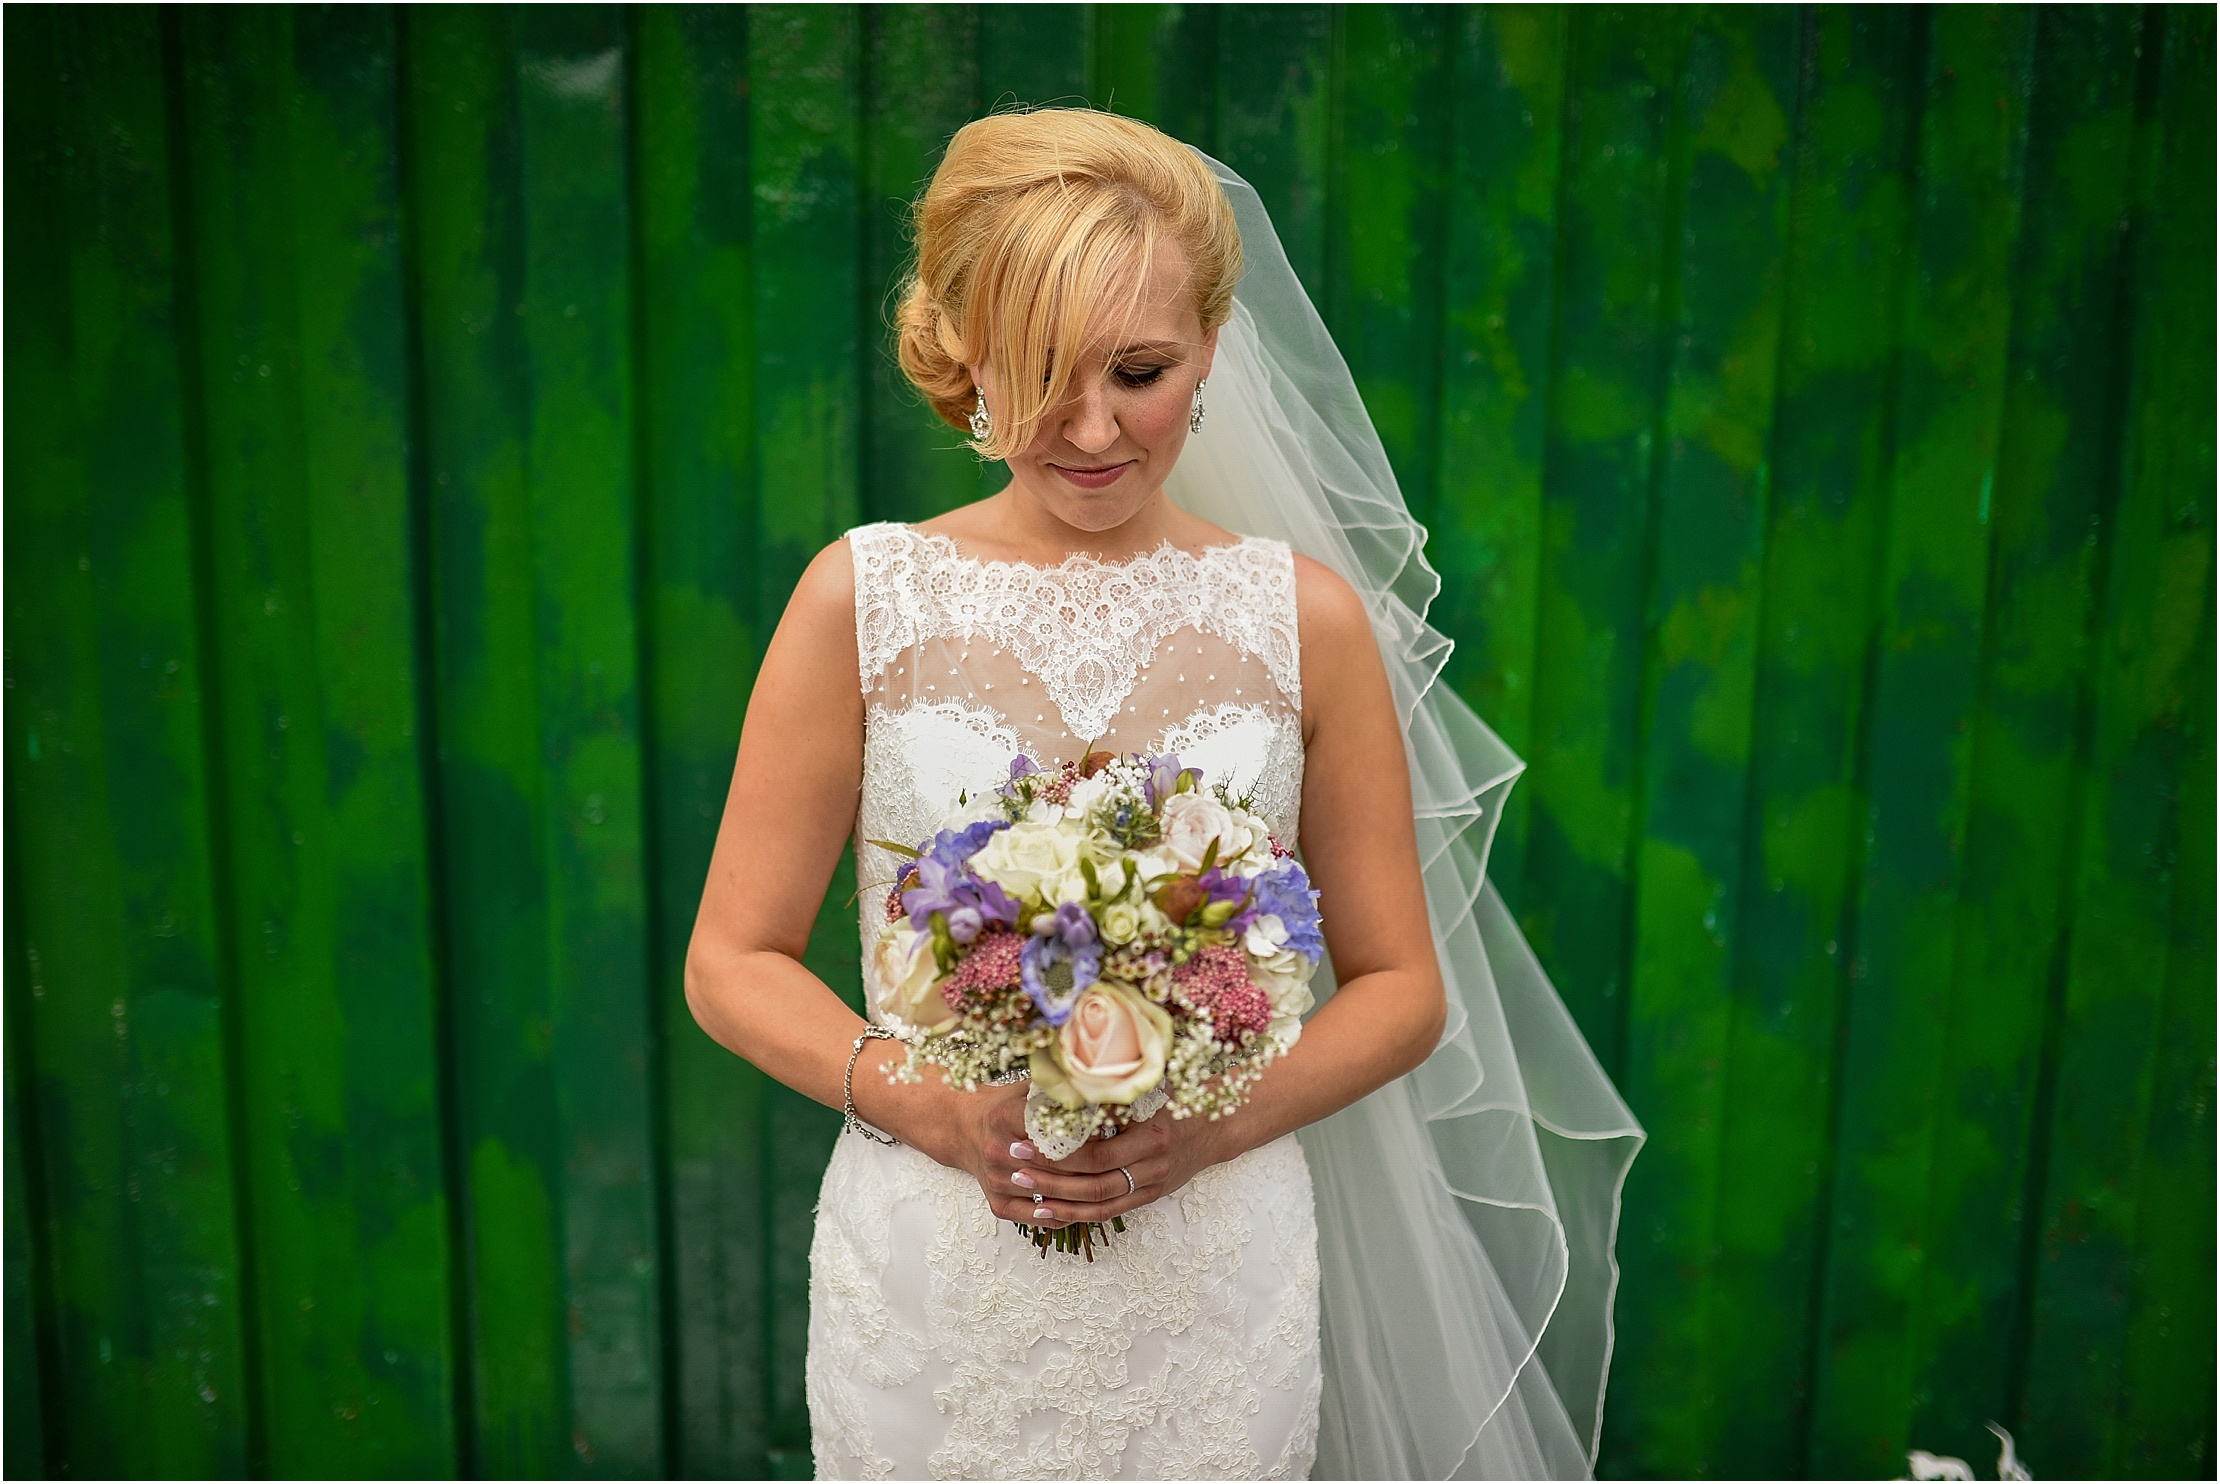 staining-lodge-wedding-089.jpg